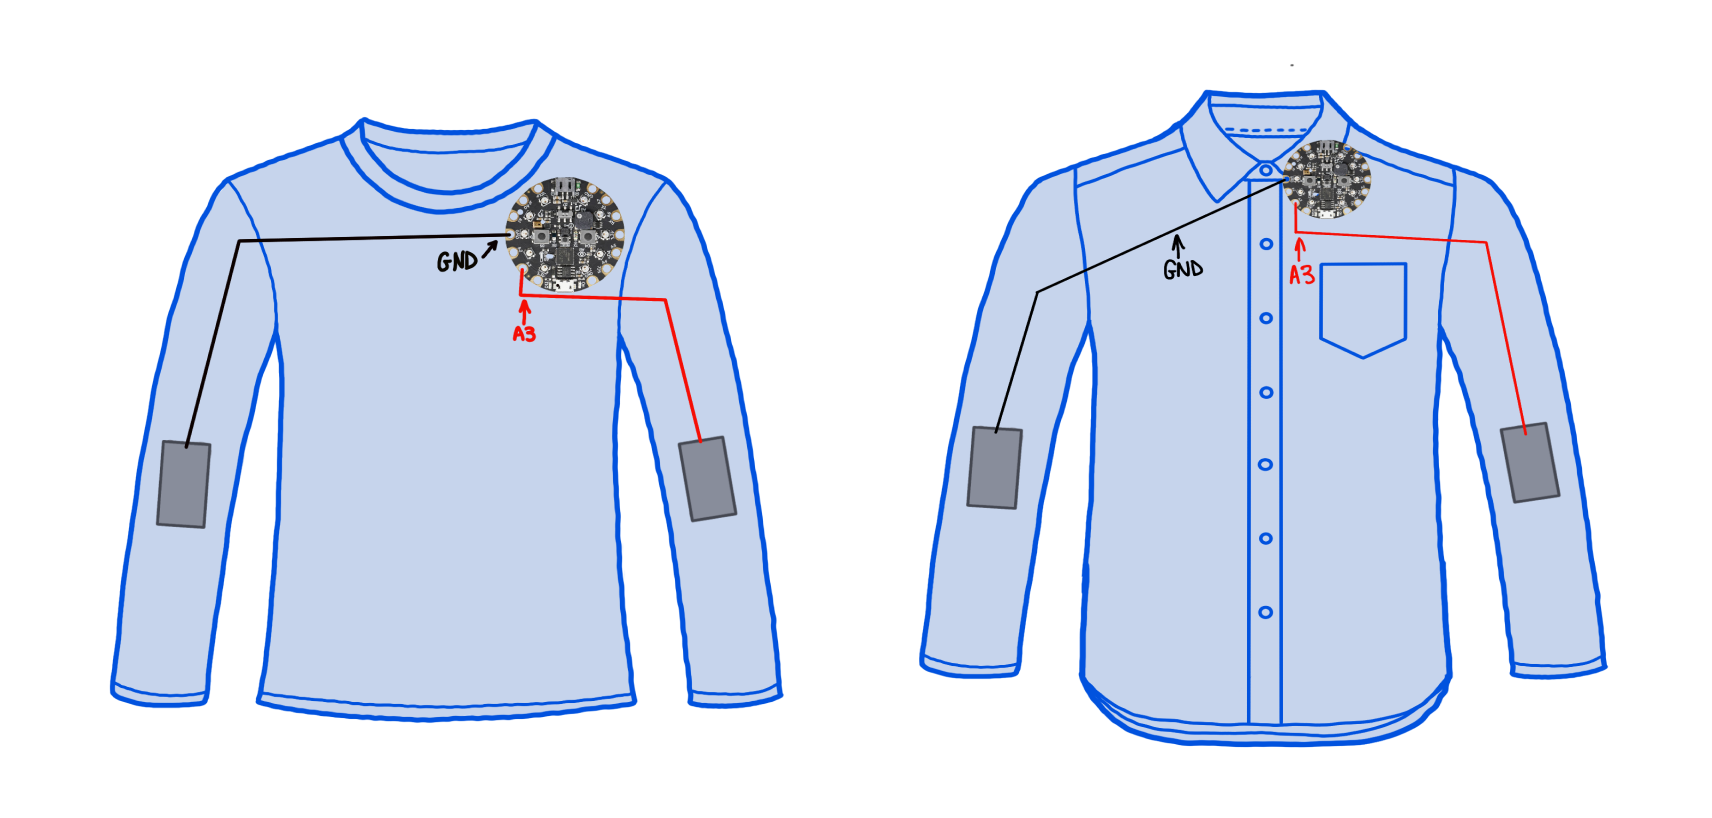 a3-circuit-diagram